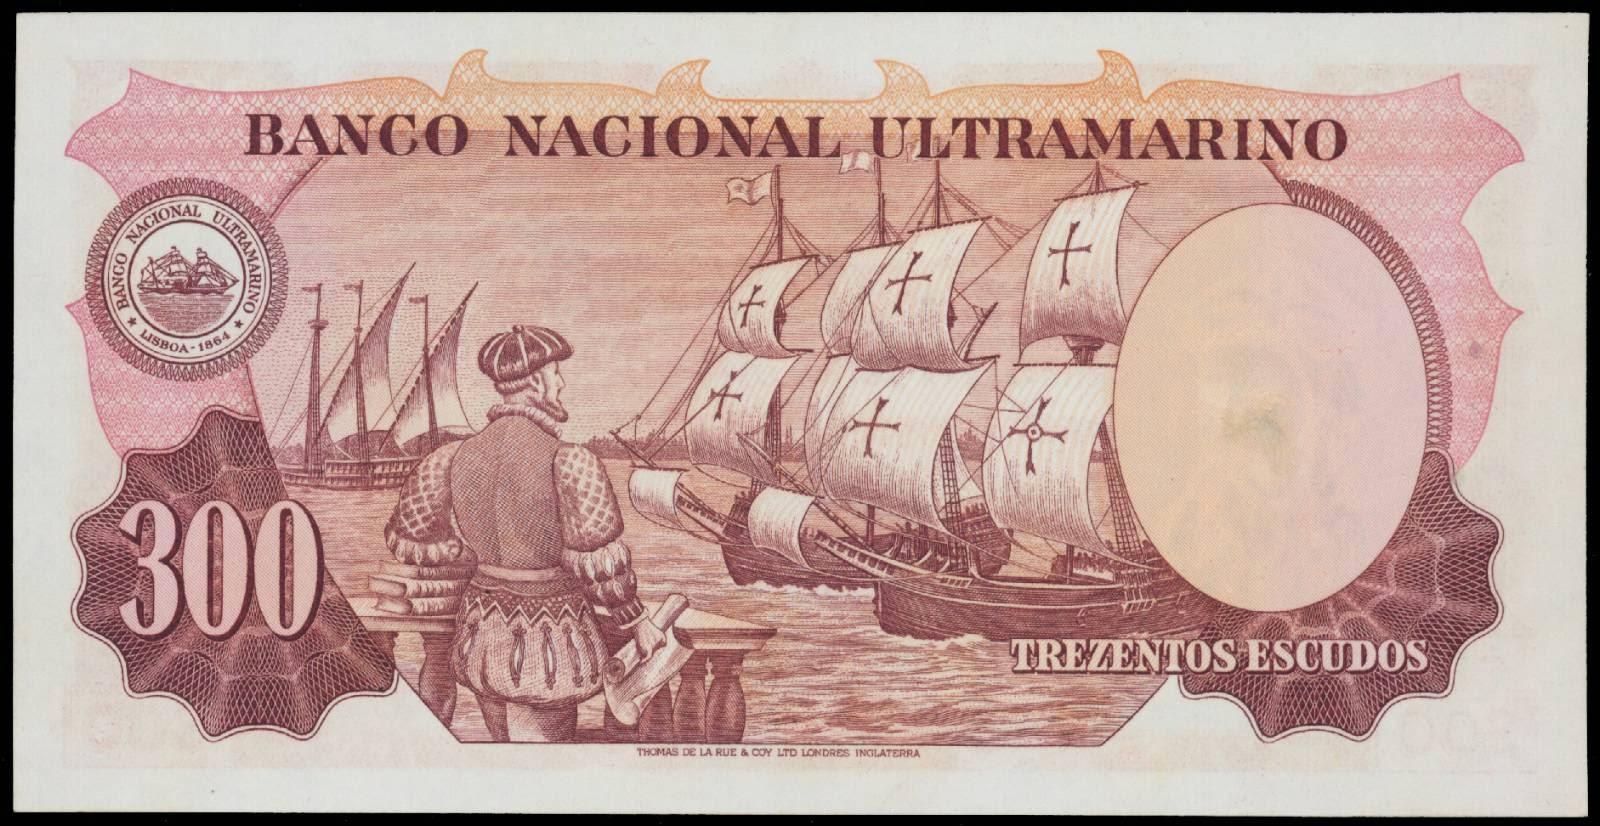 300 Portuguese Indian escudos note 1959